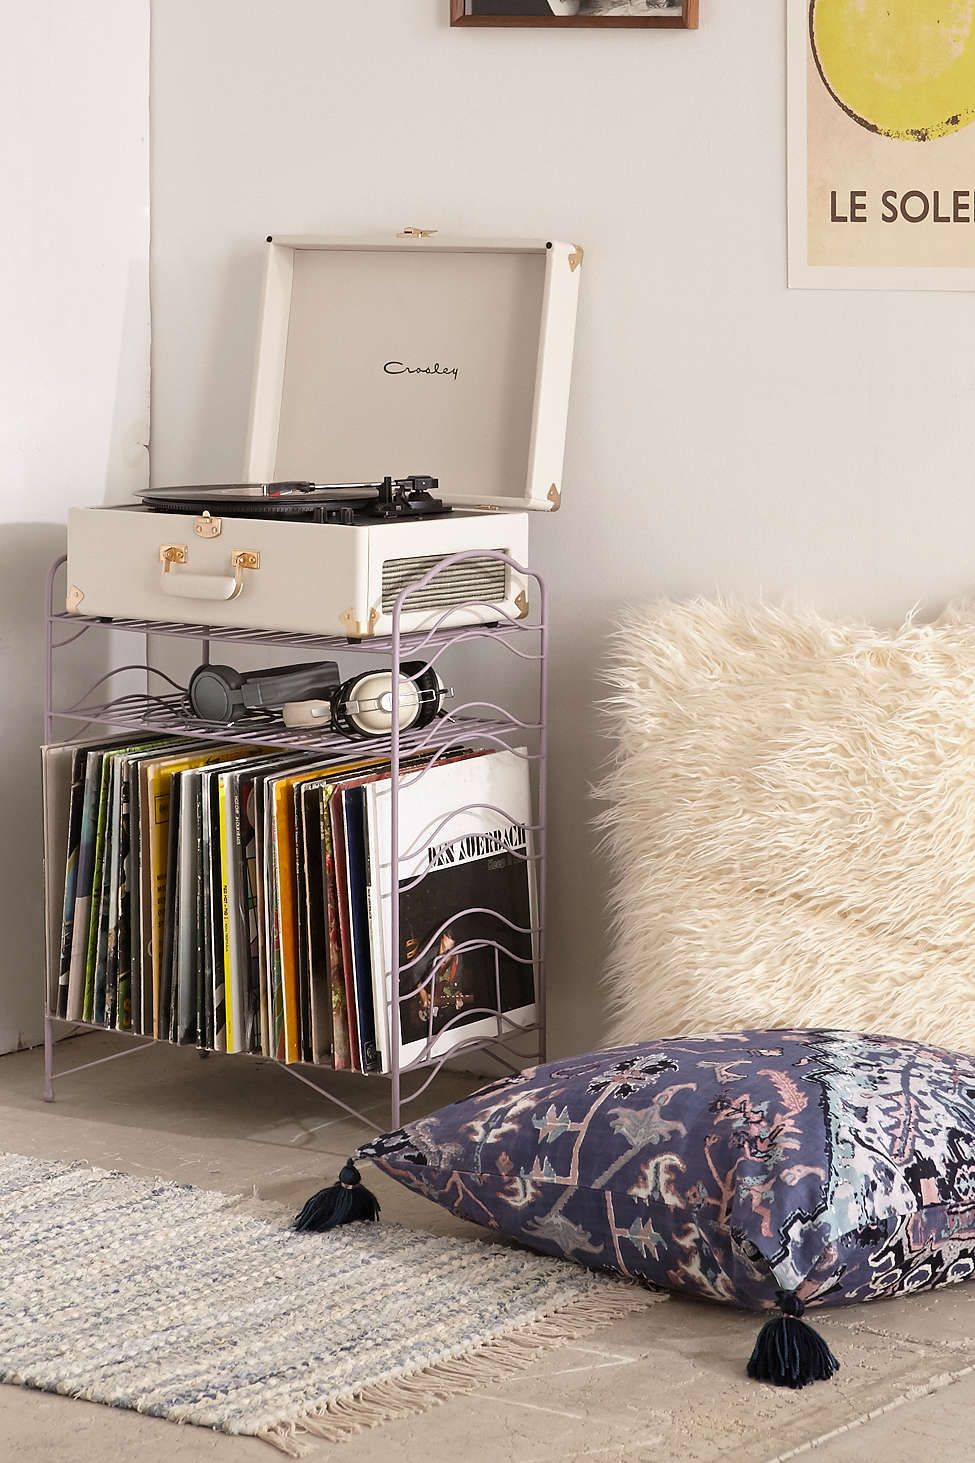 Vinyl Record Storage Shelf Dorm Room Decor Room Decor Vinyl Record Storage Shelf